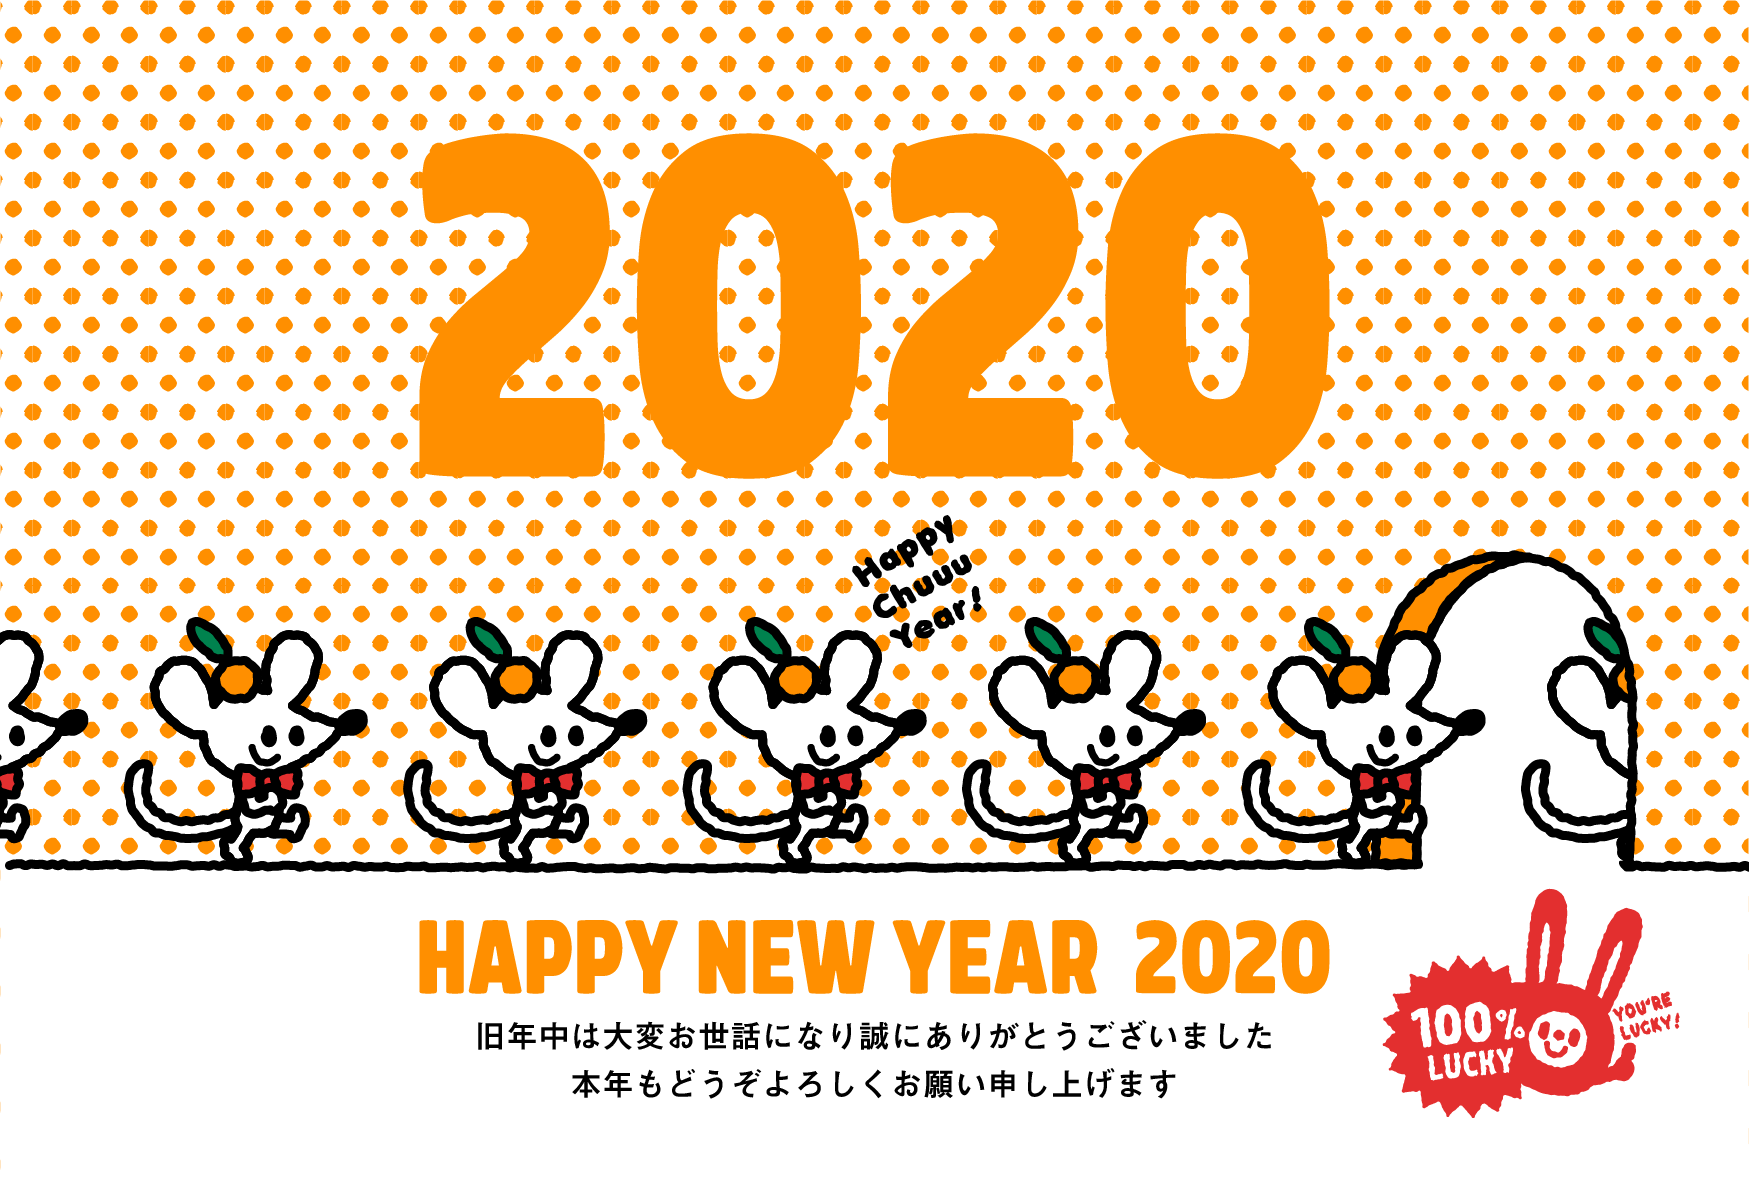 nenga2020-tarout-1004_02-illust.png